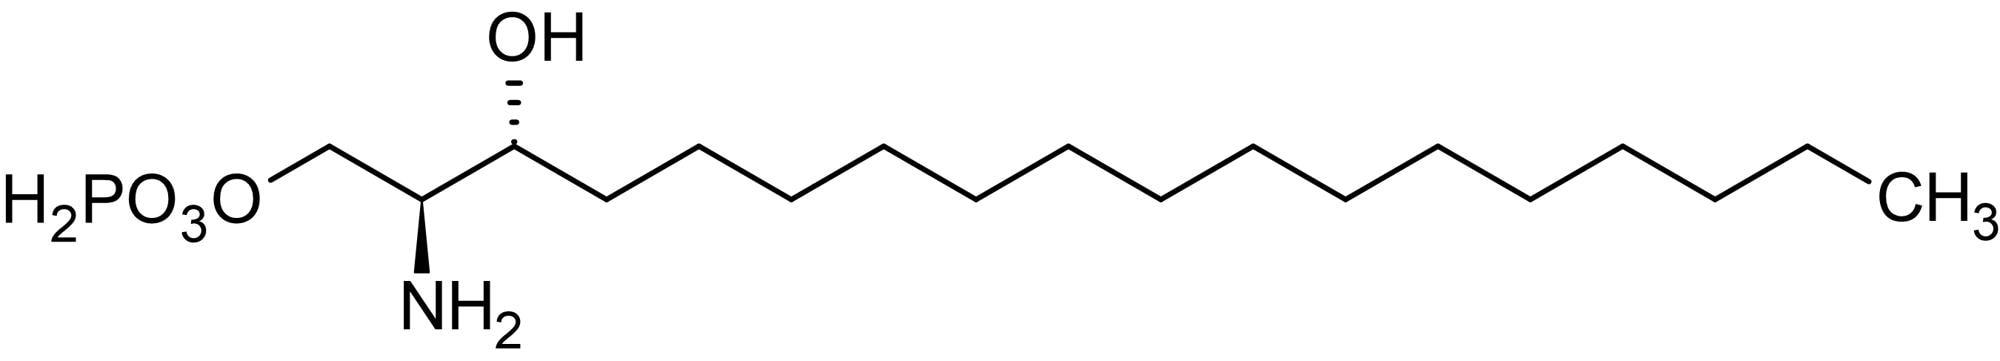 Chemical Structure - D-<em>erythro</em>-Dihydrosphingosine-1-phosphate, sphingosine 1-phosphate receptor ligand (ab141750)